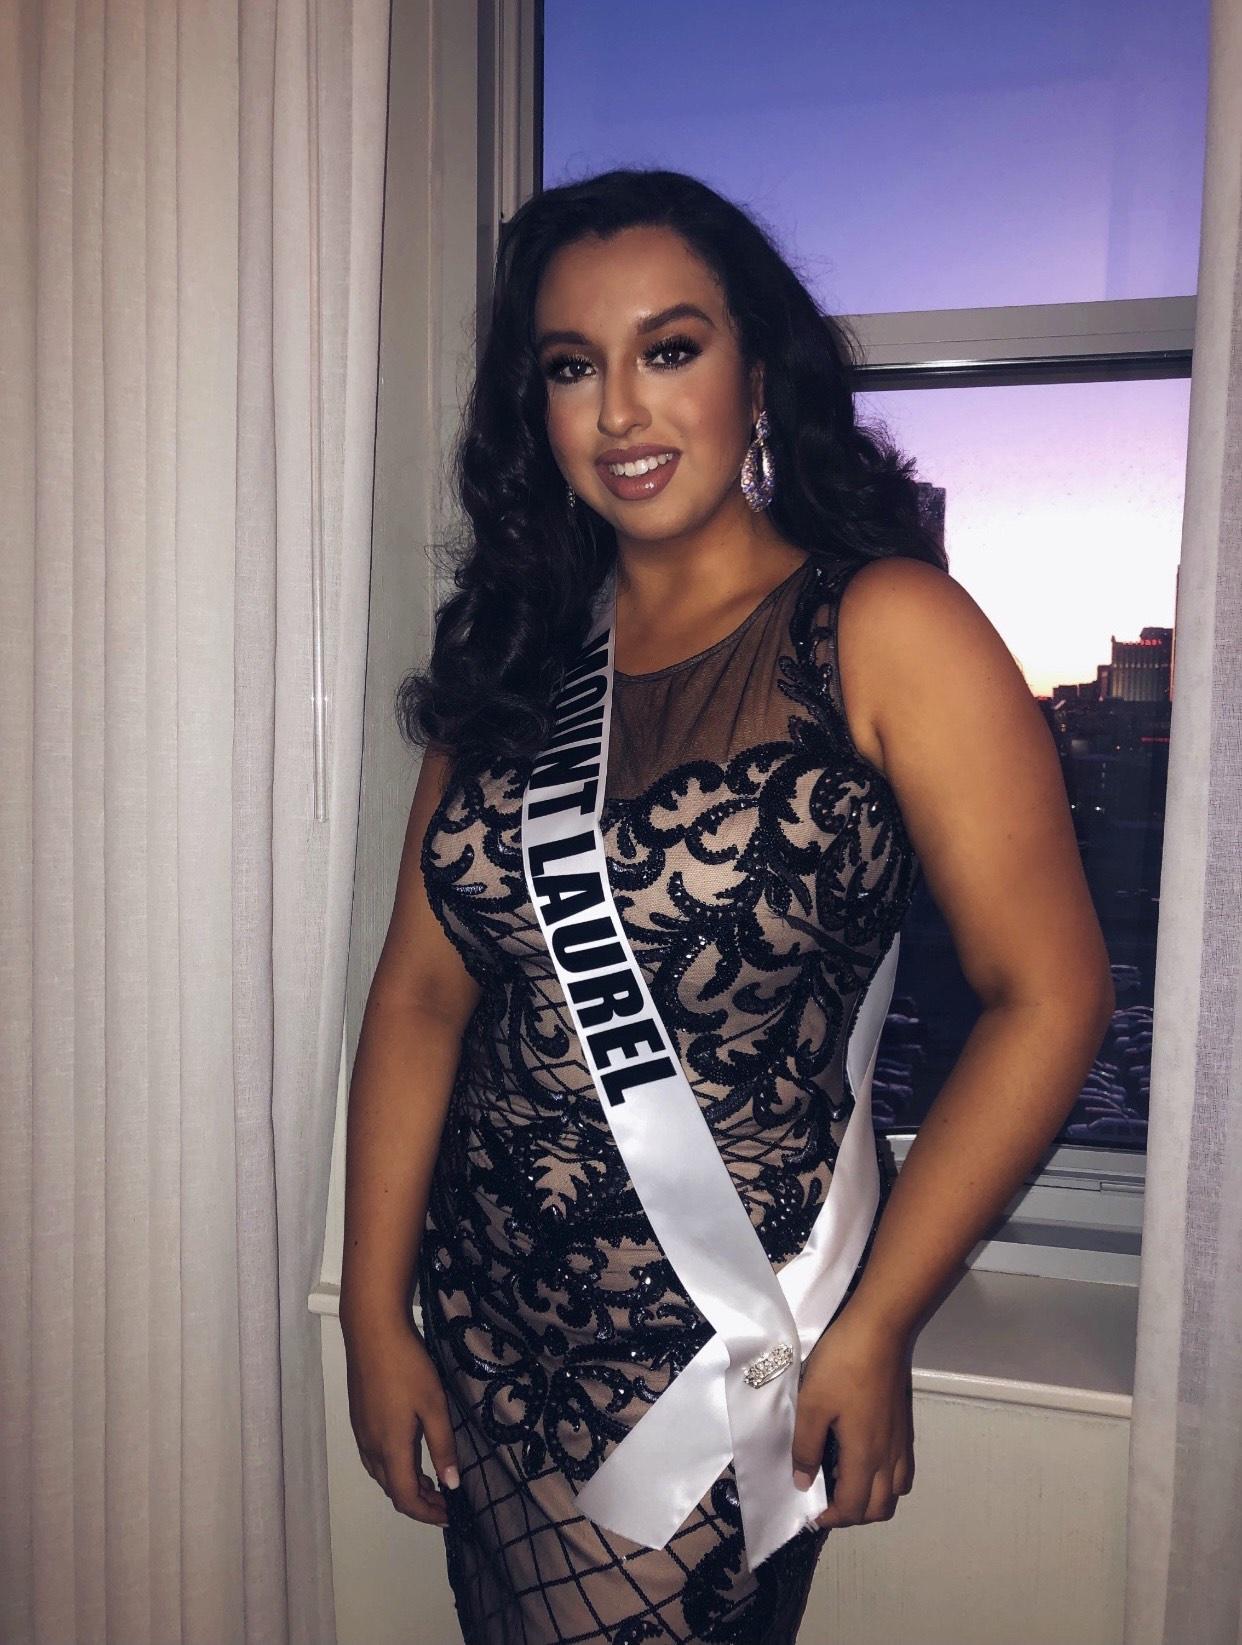 Alyce Paris Black Size 14 Graduation Sorority Formal Wedding Guest Cocktail Dress on Queenly